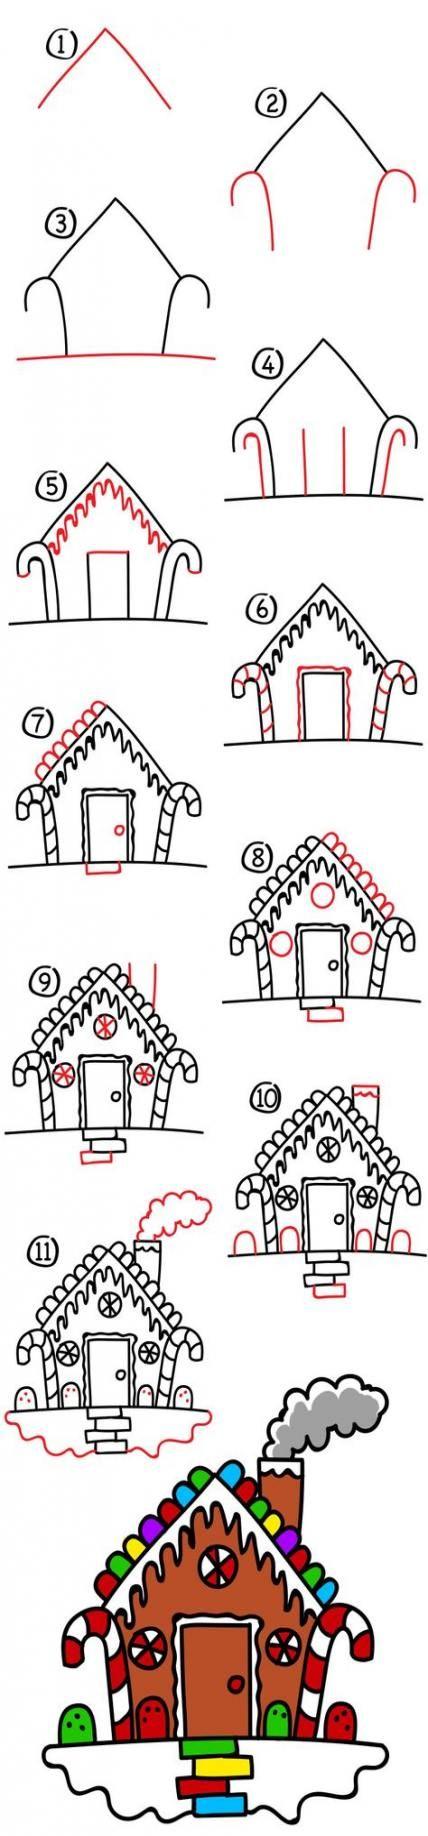 Drawing christmas house 38+ ideas | Art lessons for kids, Art for kids hub, Christmas doodles